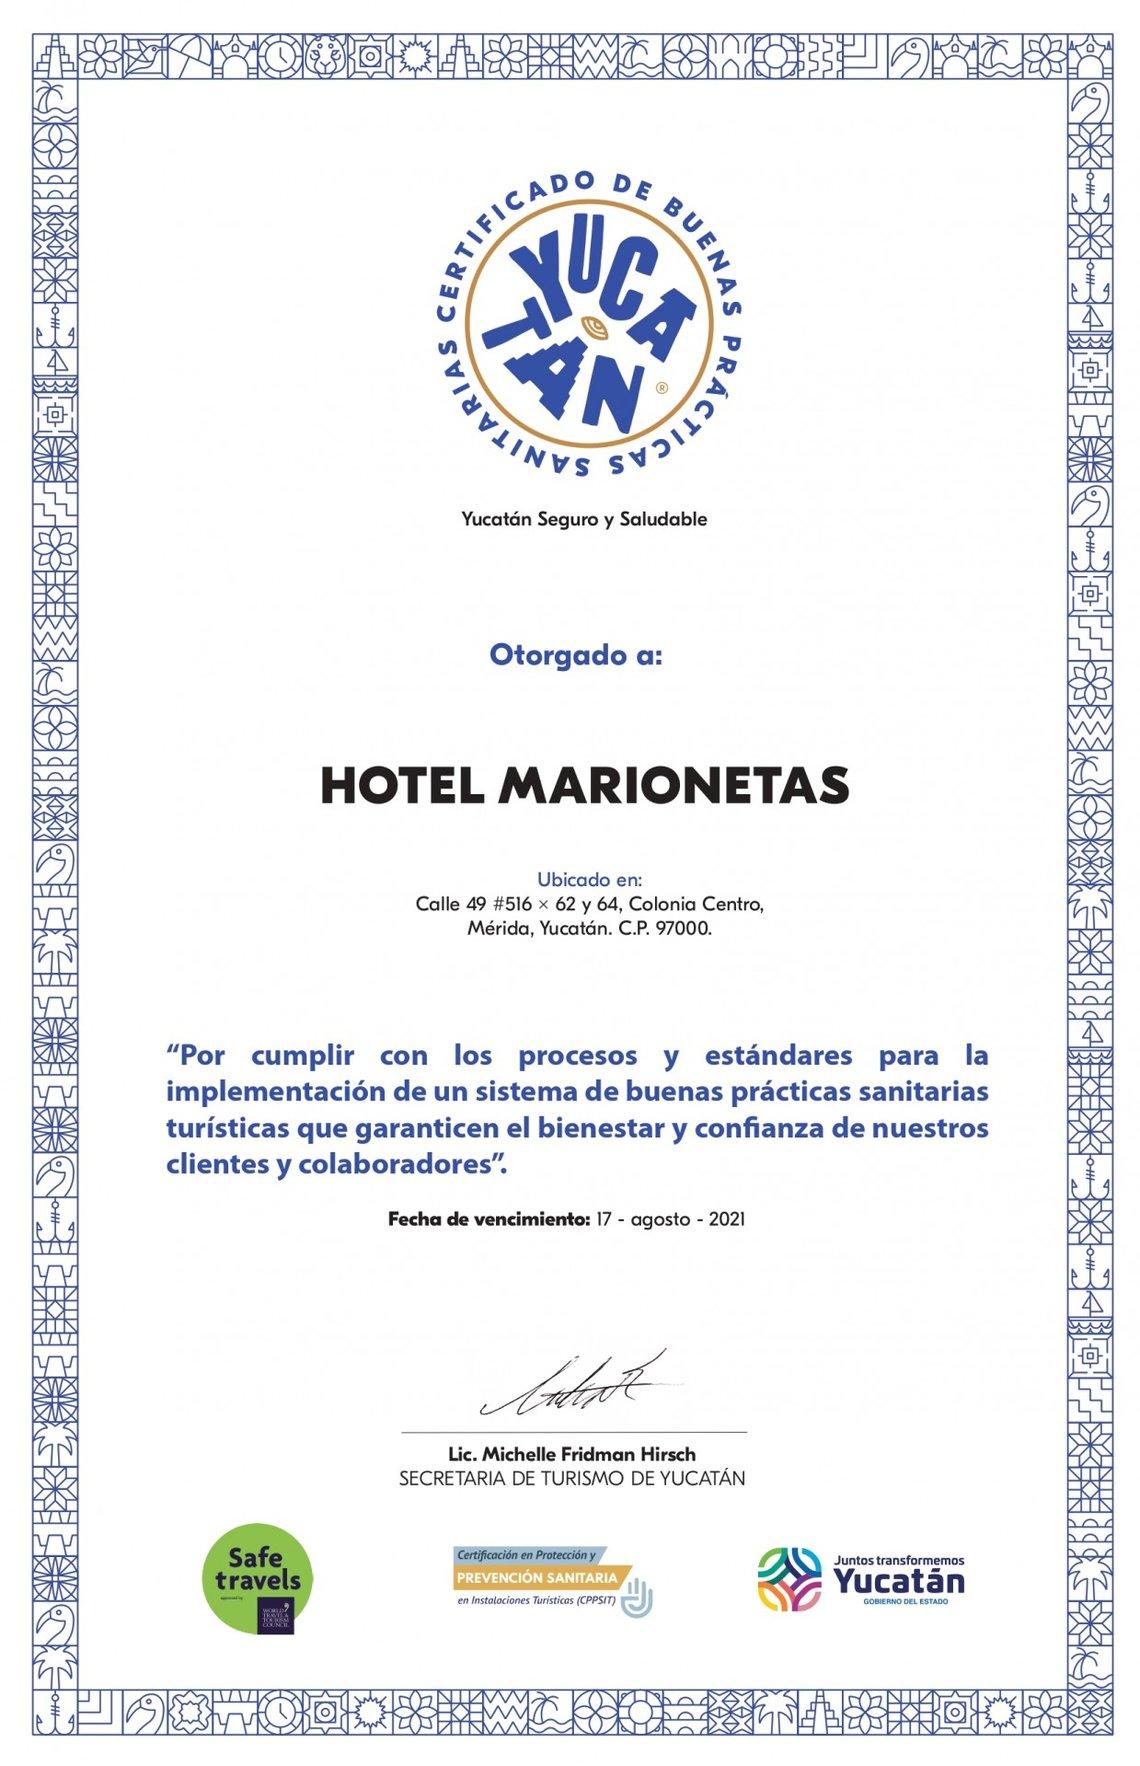 Hotel Marionetas